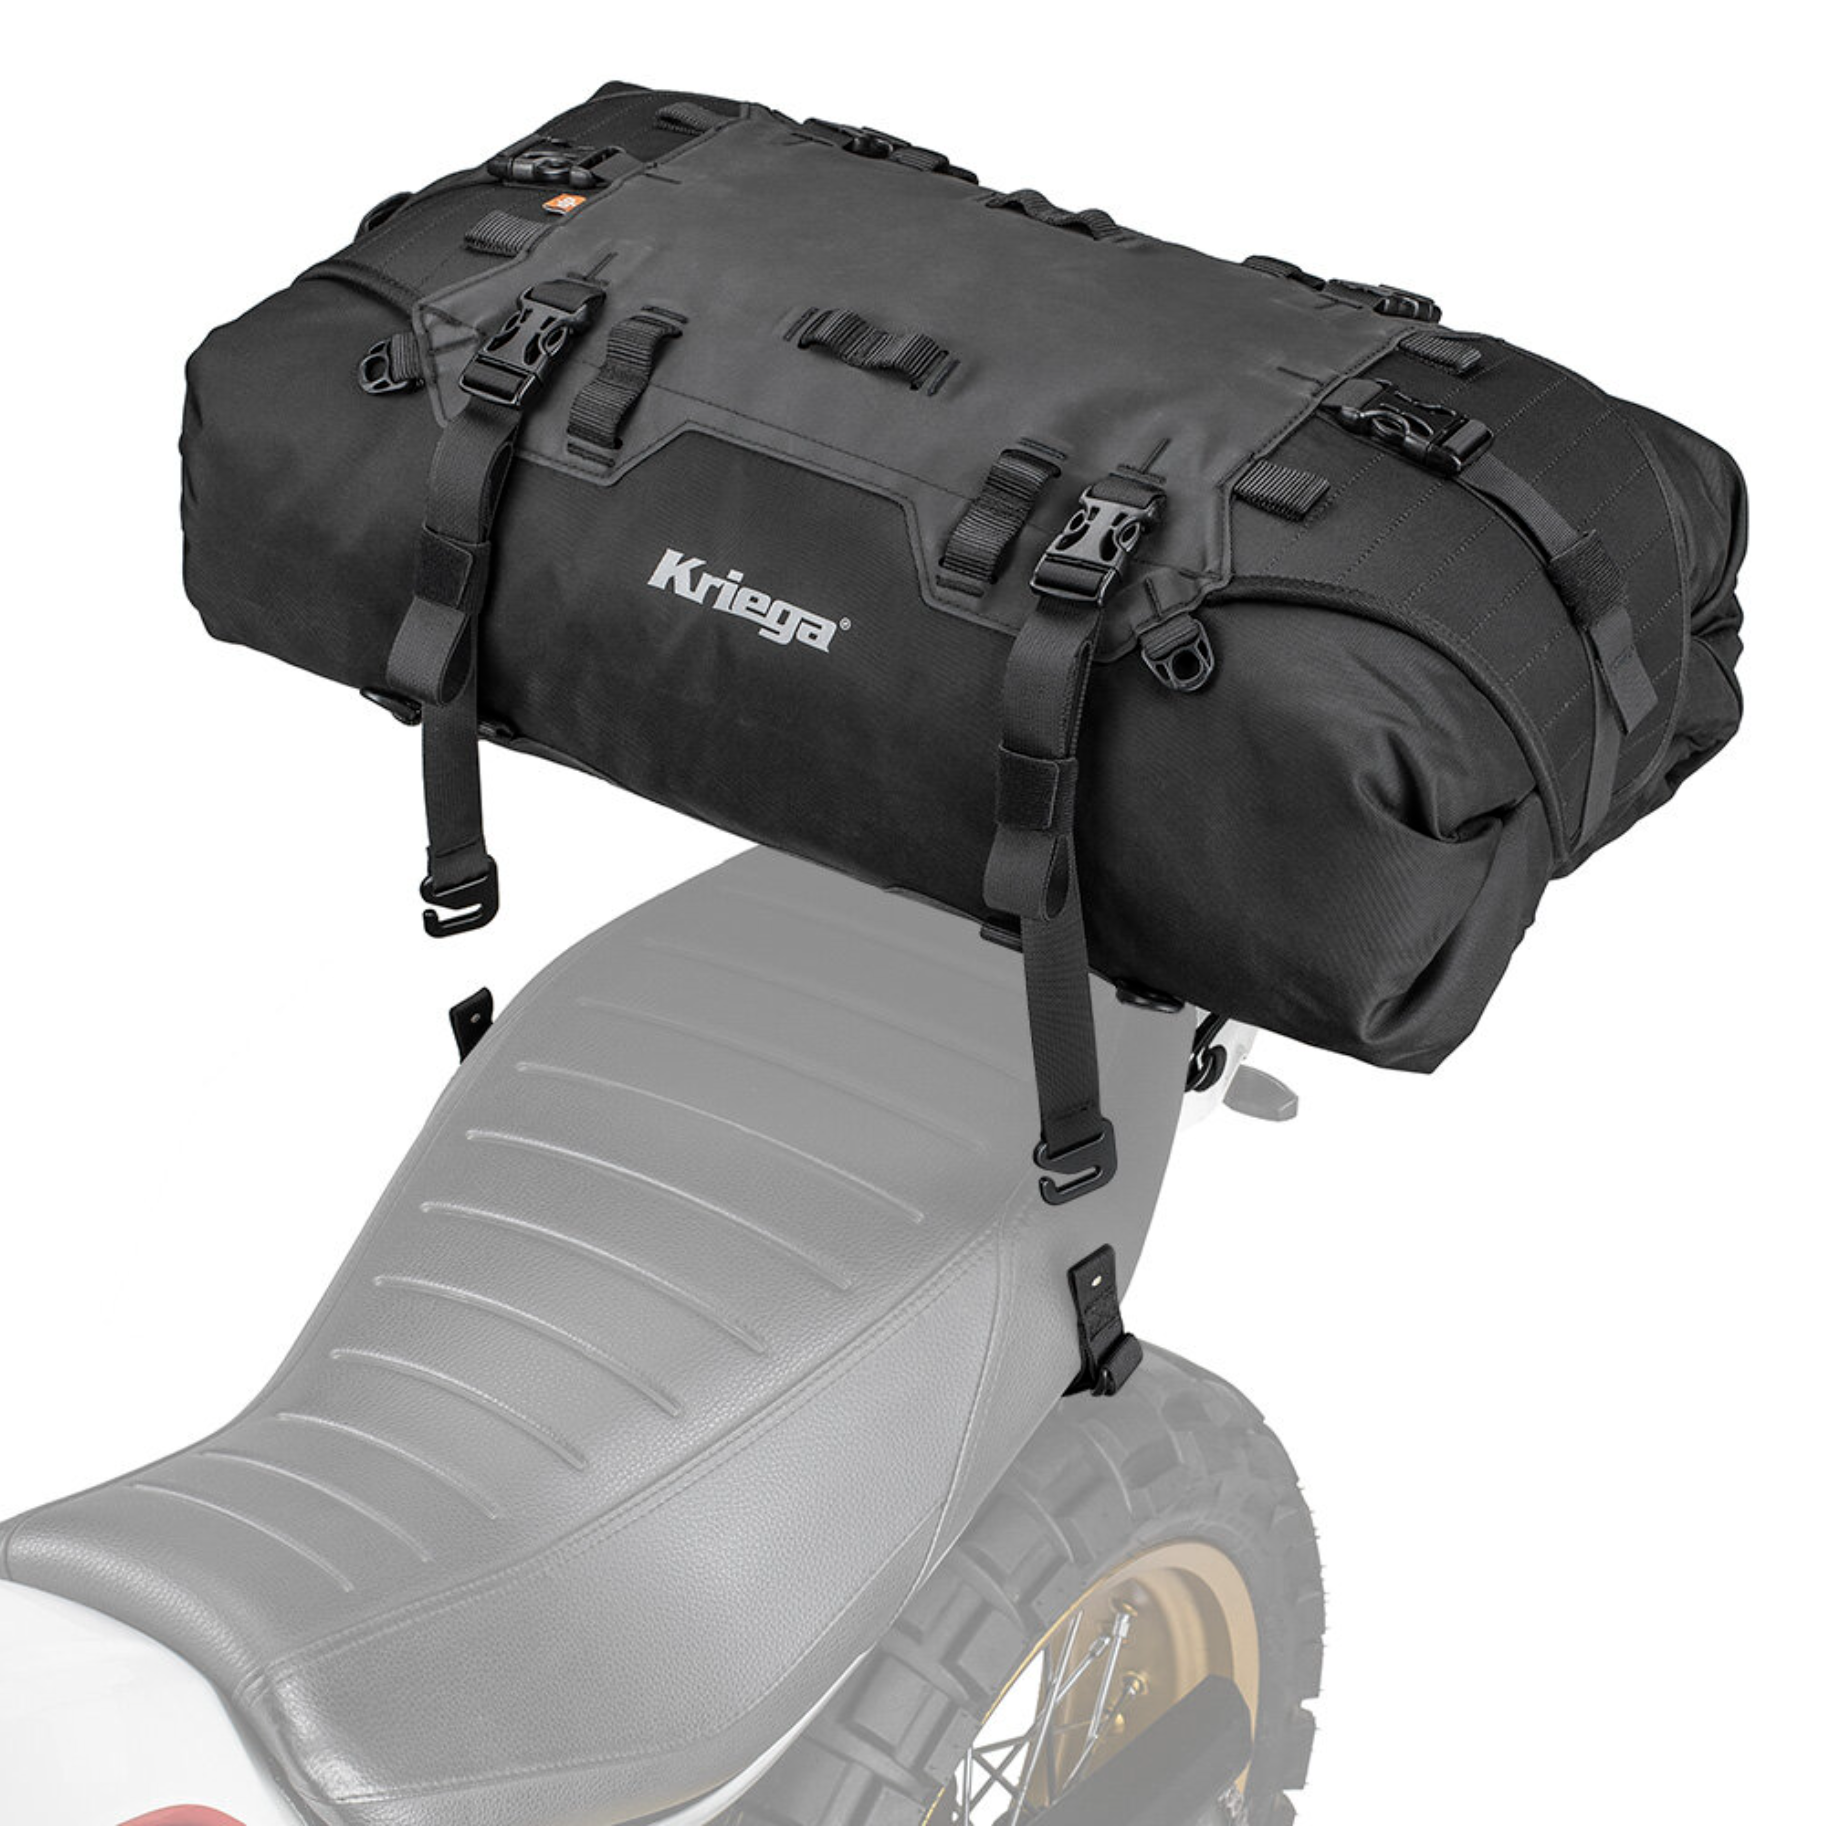 Kriega-US-40-Drypack-Tasche-Halter-02